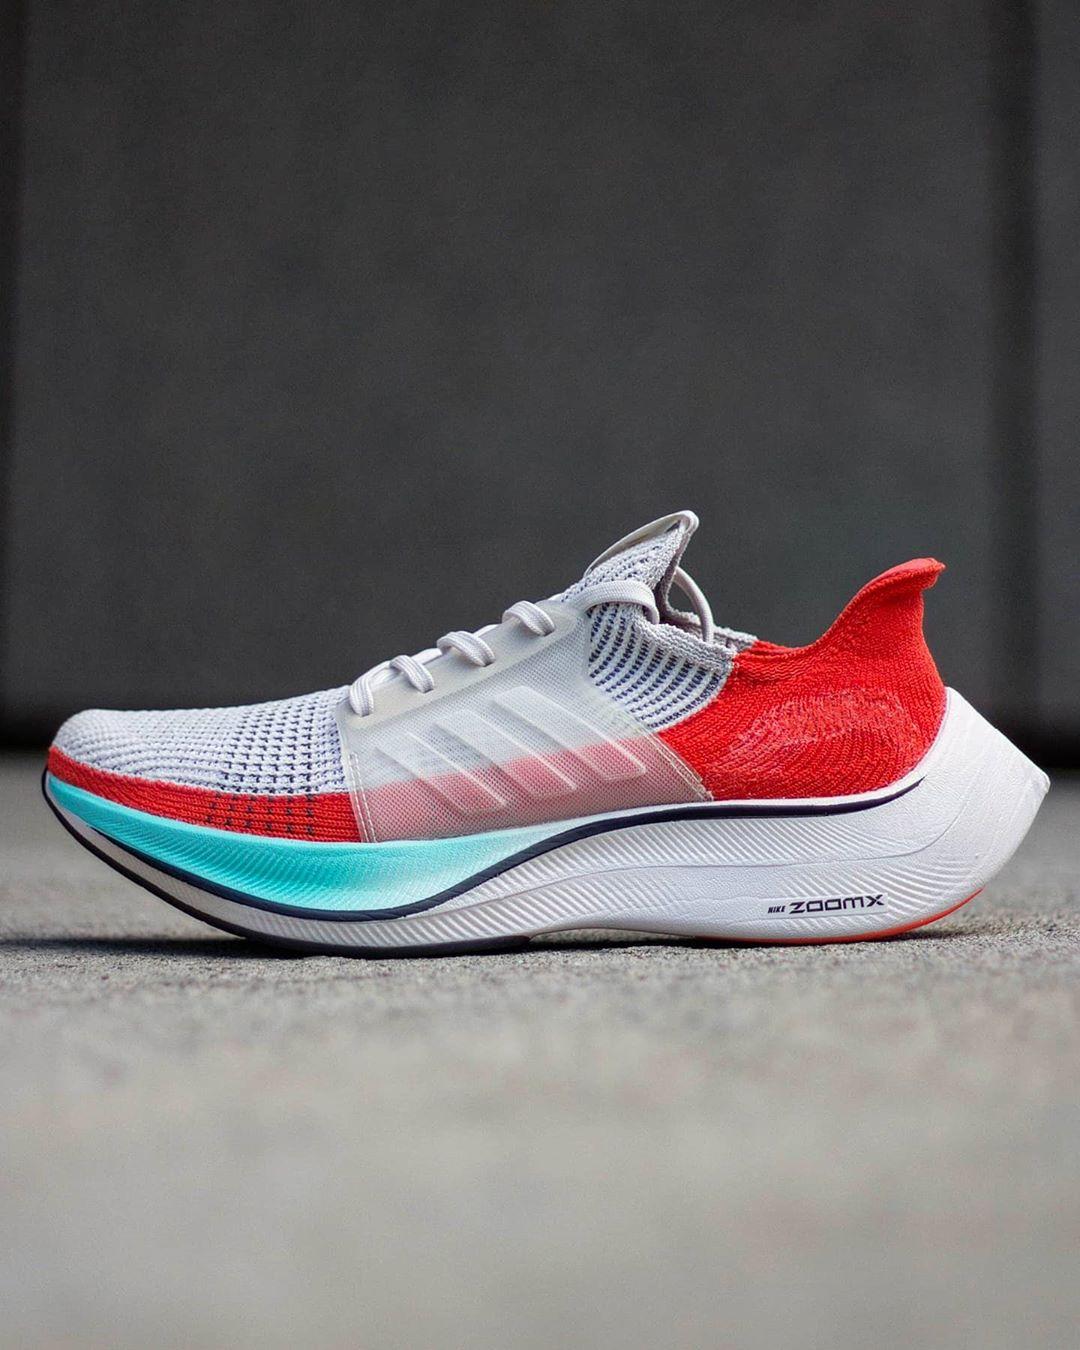 govrn-running-hybride-nike-adidas-UB19-next-2